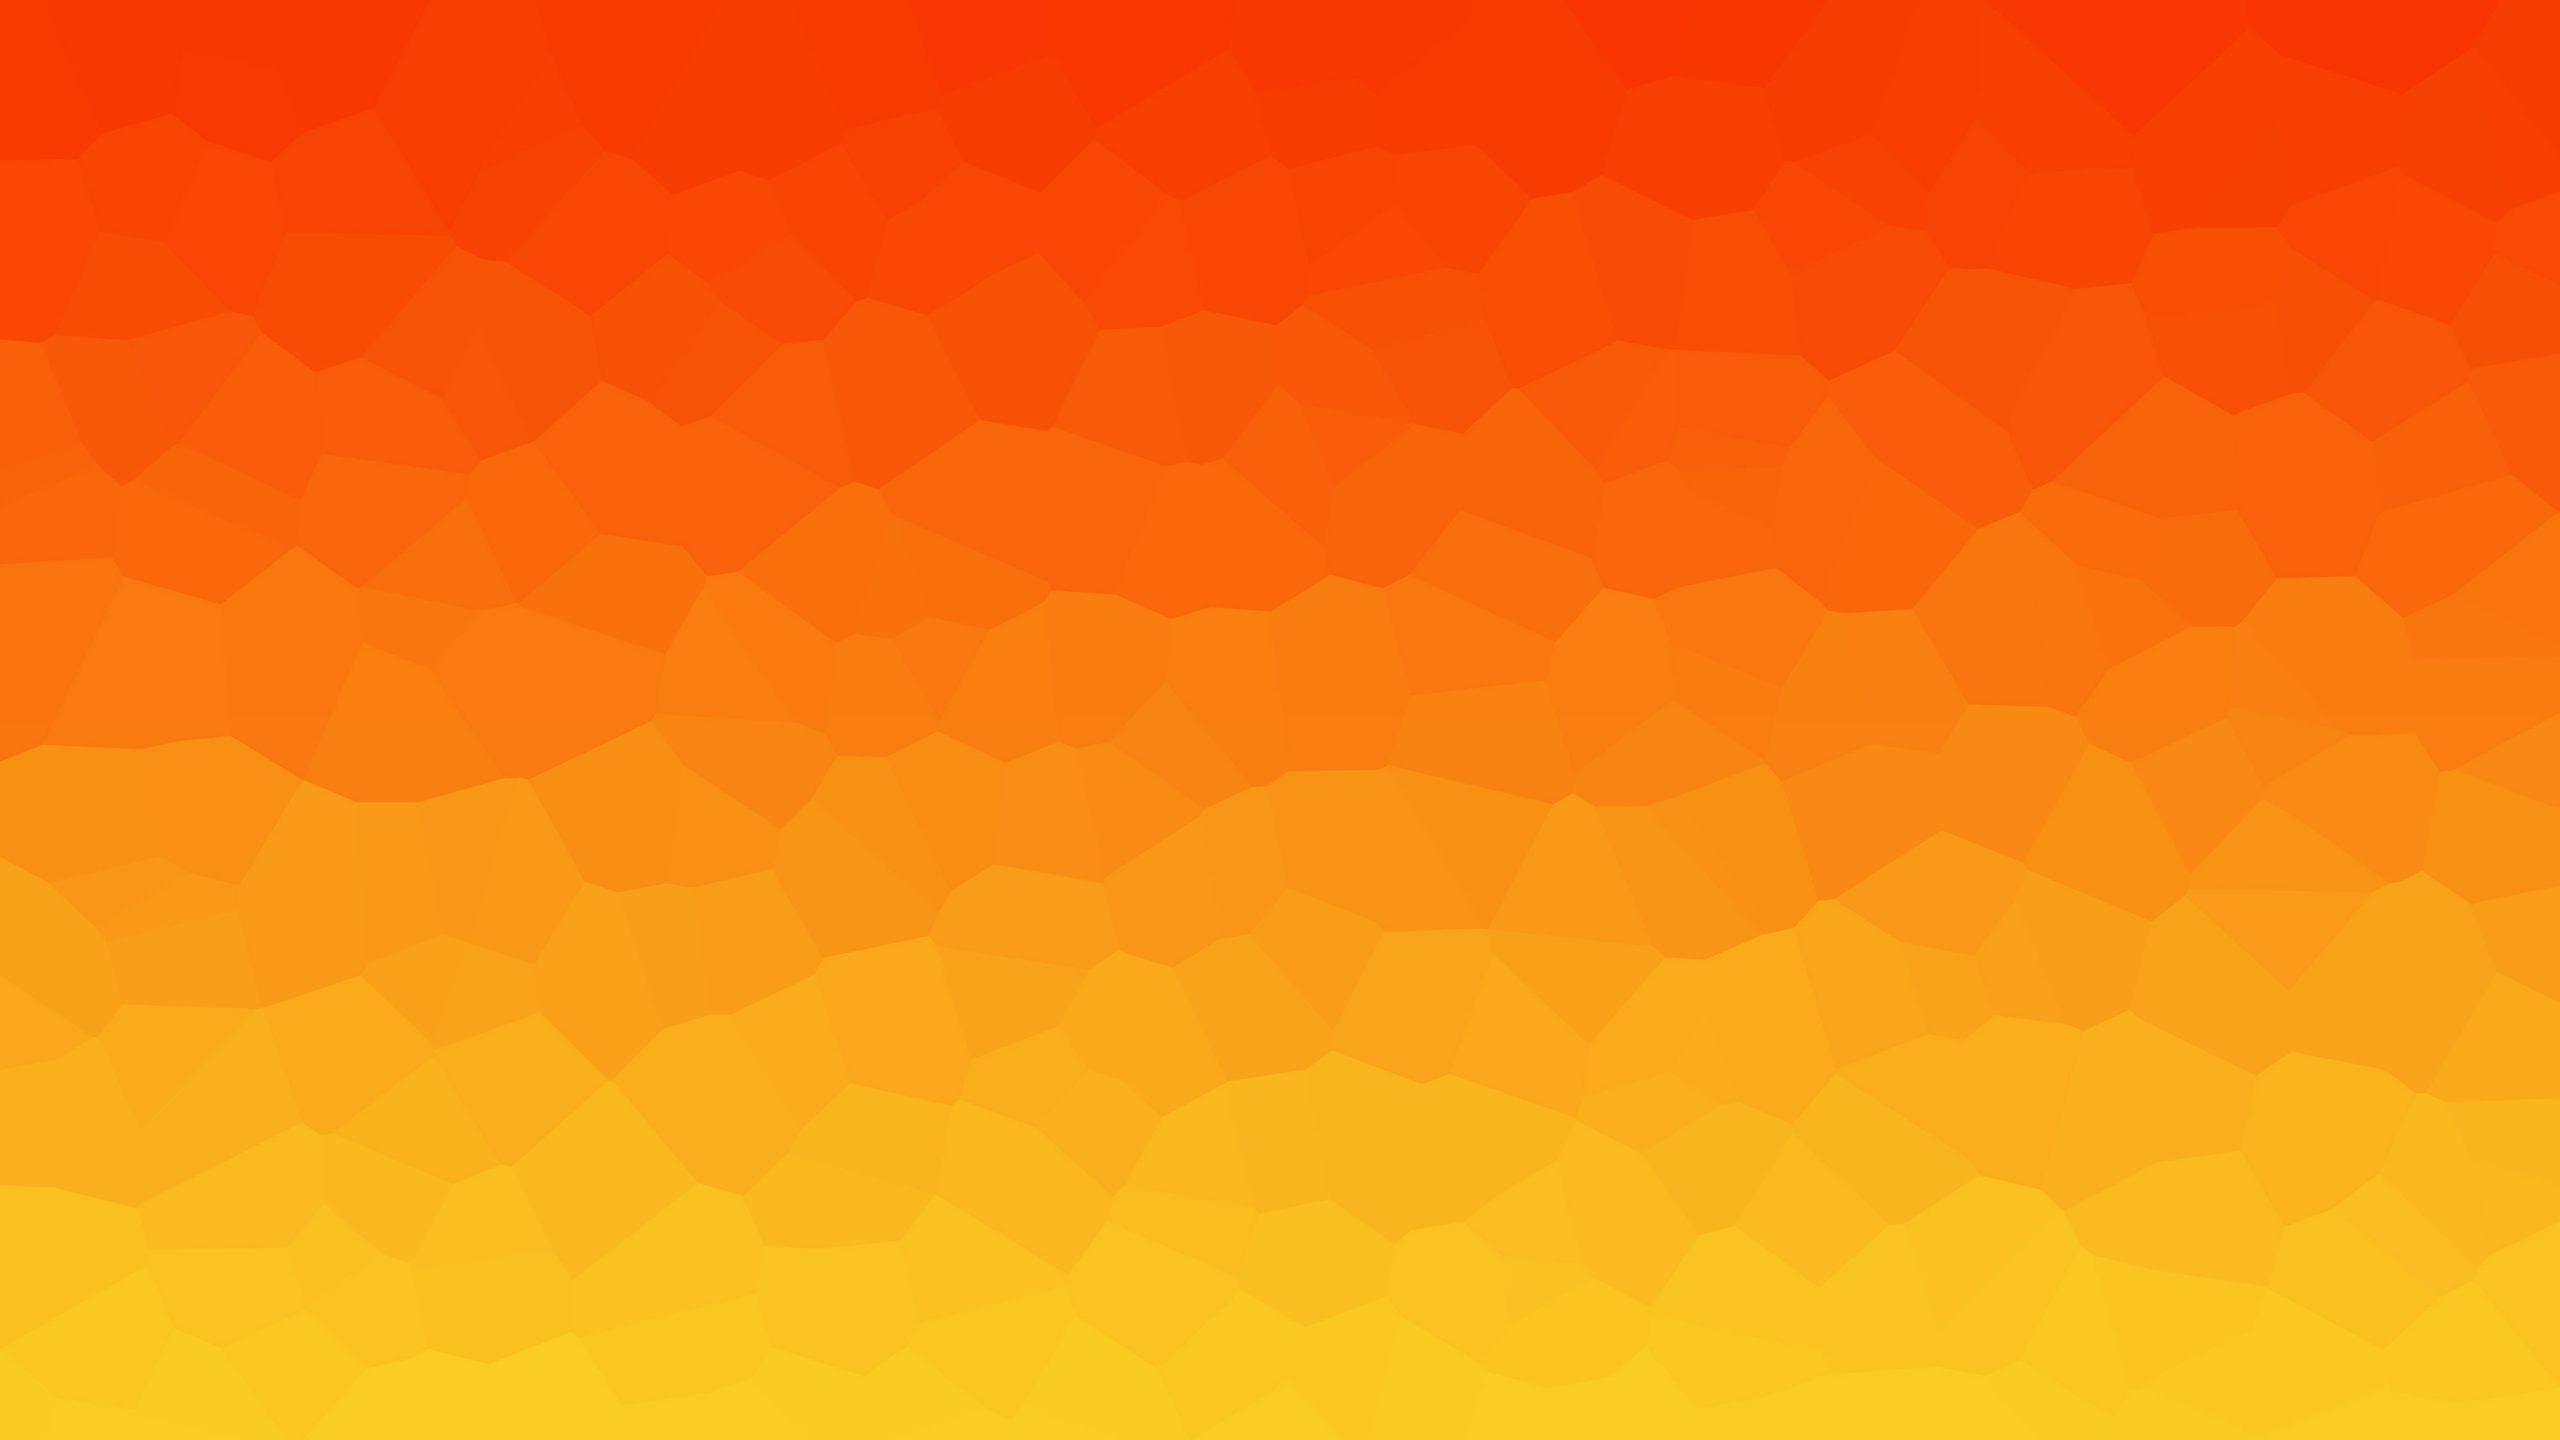 yellow-orange-background